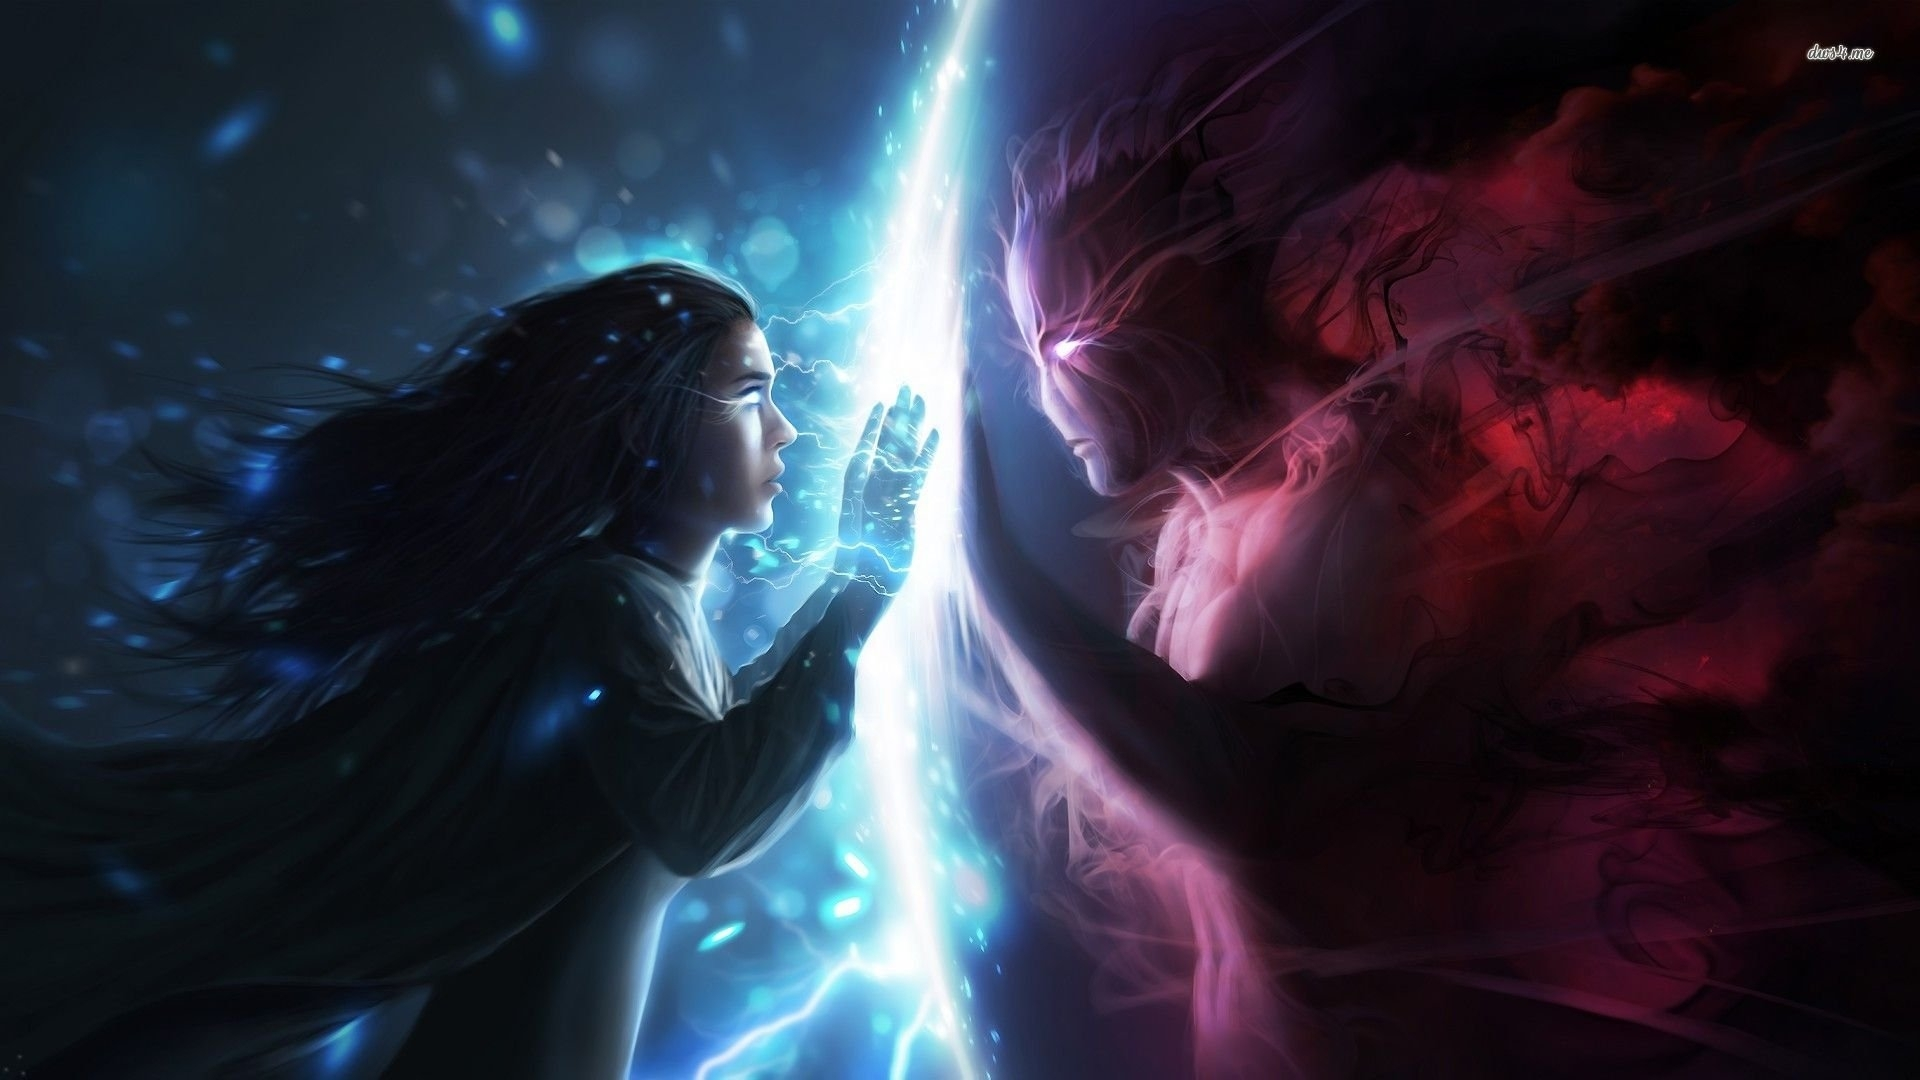 angel and demon romance - walldevil